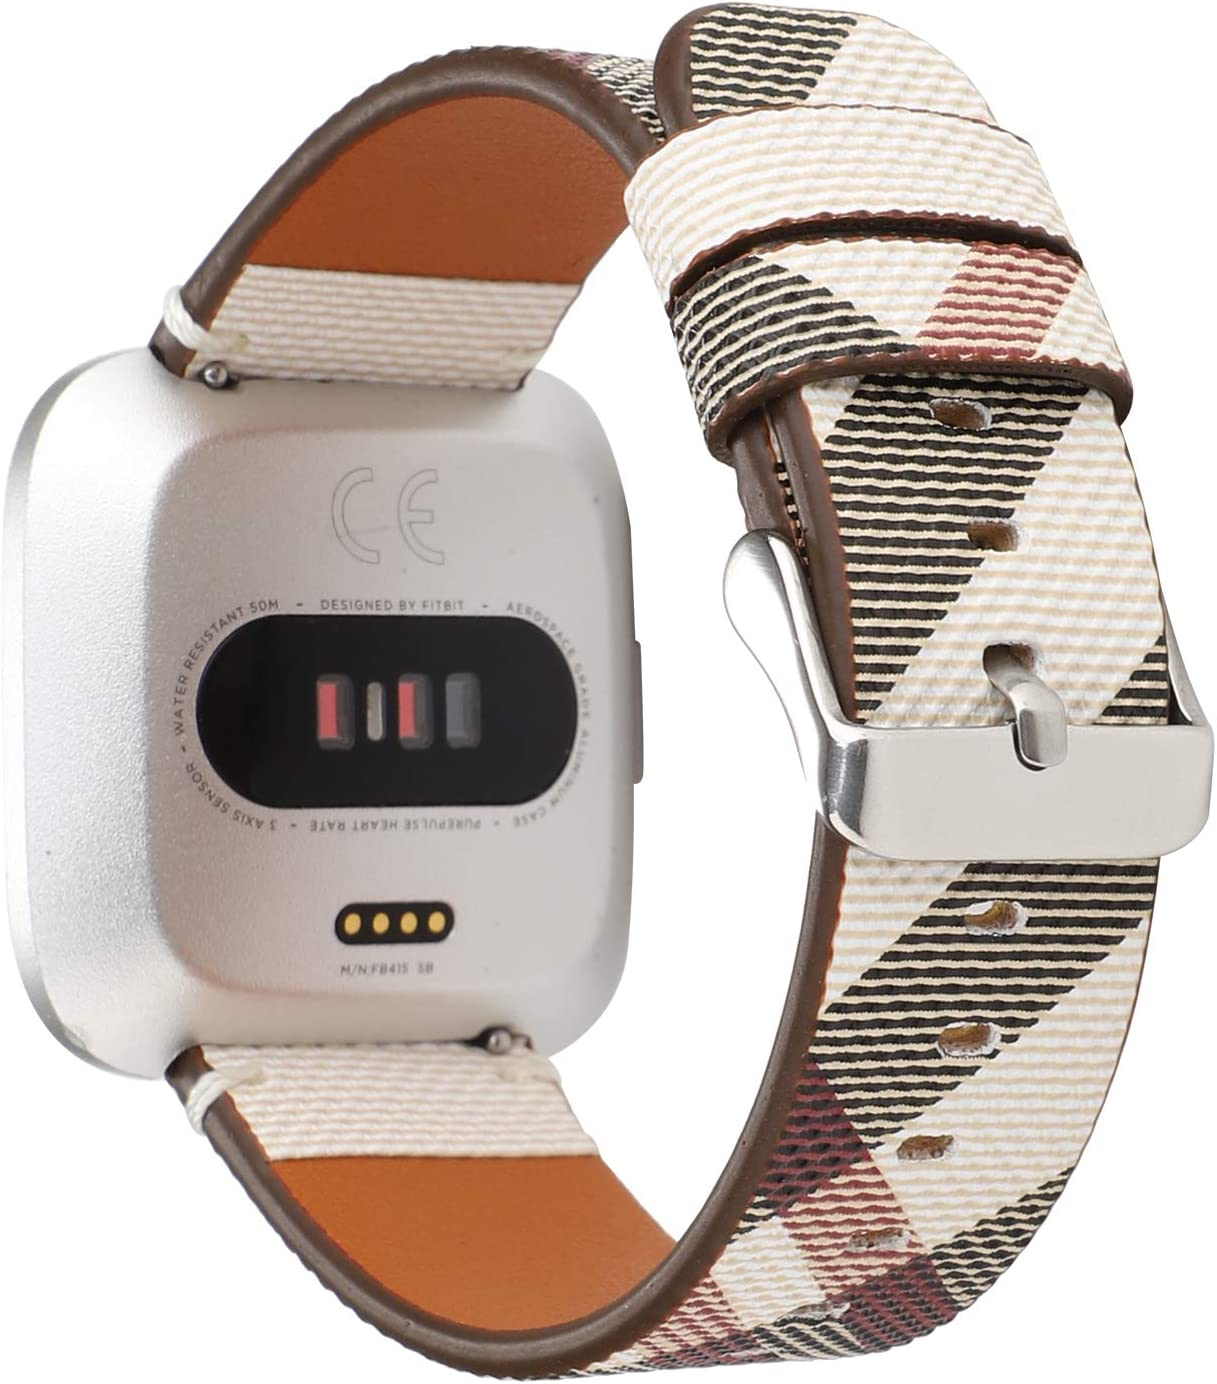 Bands for Fitbit Versa & Versa Lite/Versa 2, Jimbird PU Leather Replacement Bracelet Wrist Watch Band for Fitbit Versa Fitness Smart Watch (Stripe)